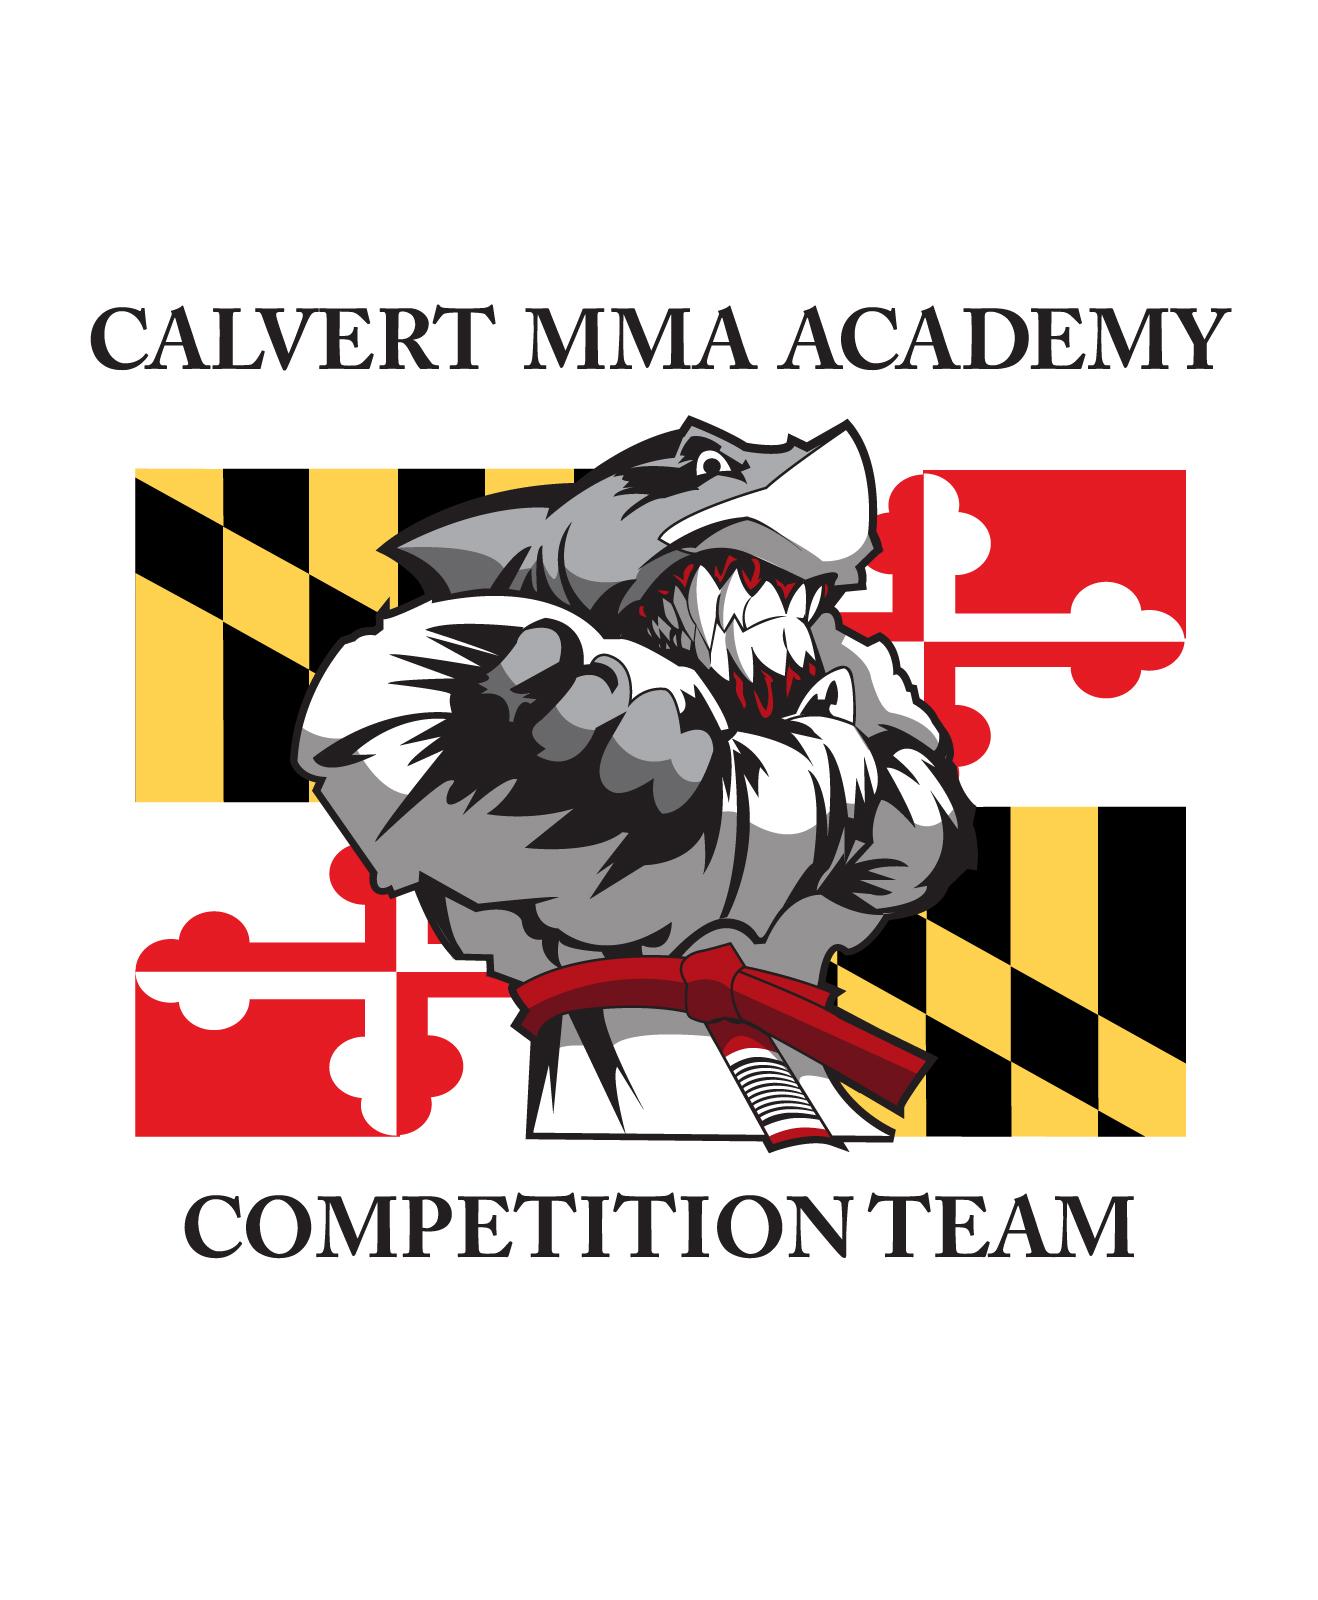 Calvert MMA Academy - Lineage BJJ / Lotus Thai Boxing